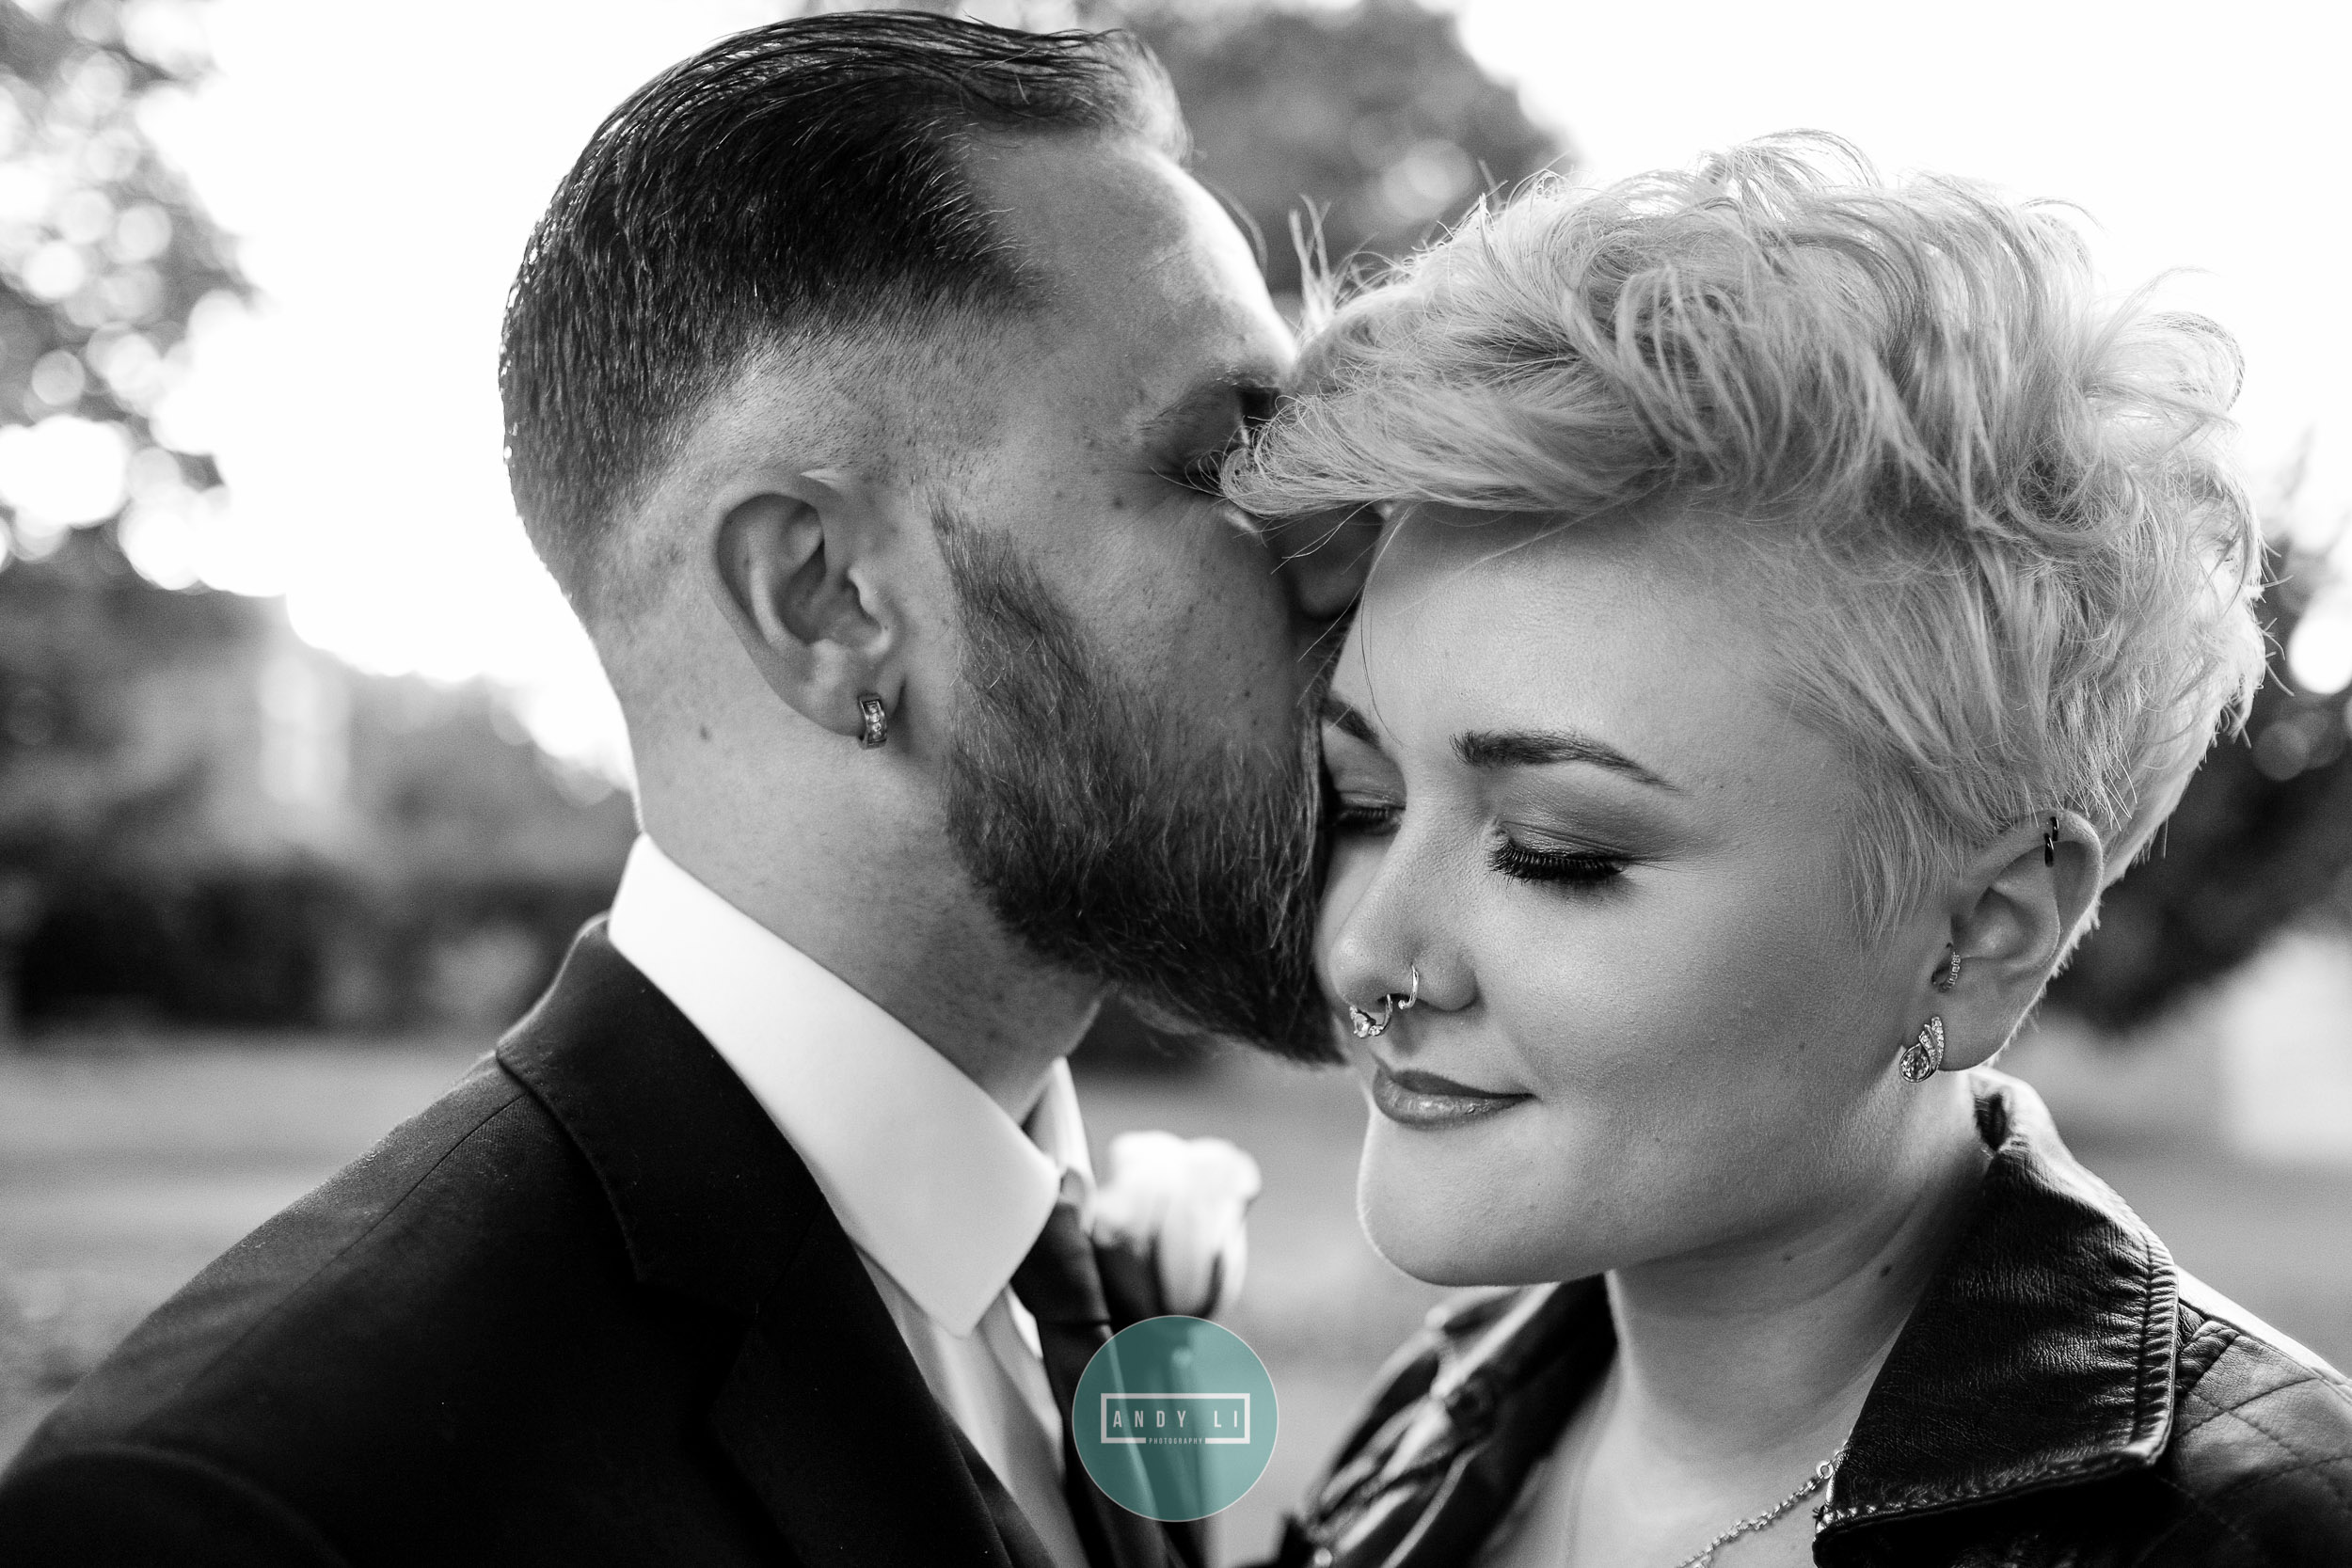 Shropshire Wedding Photographer-001-AXT22844.jpg